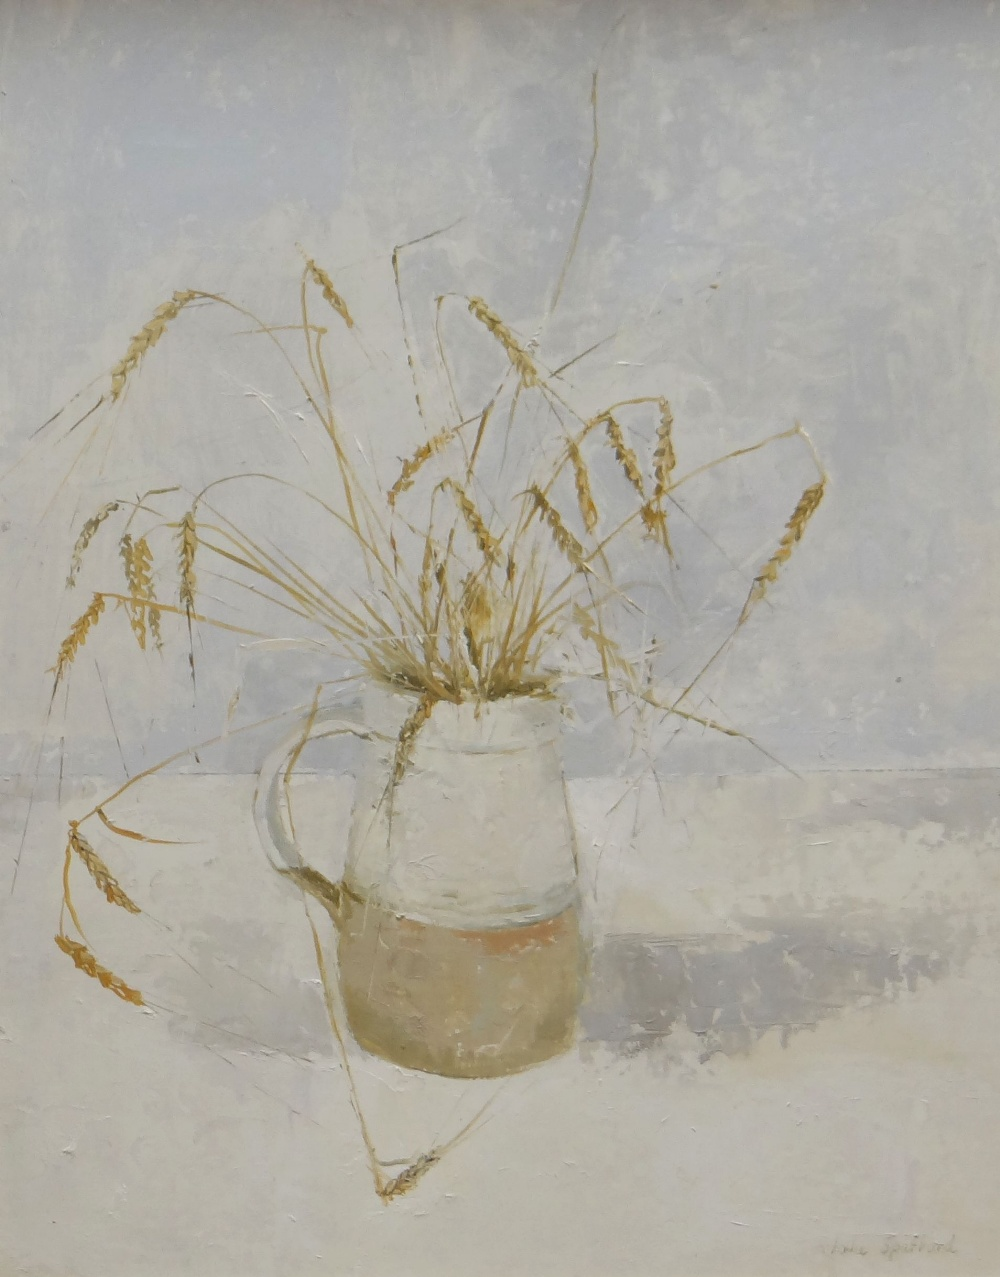 IOLA SPAFFORD oil on board - still-life, entitled verso 'Barley', signed, 48 x 39cms Provenance: